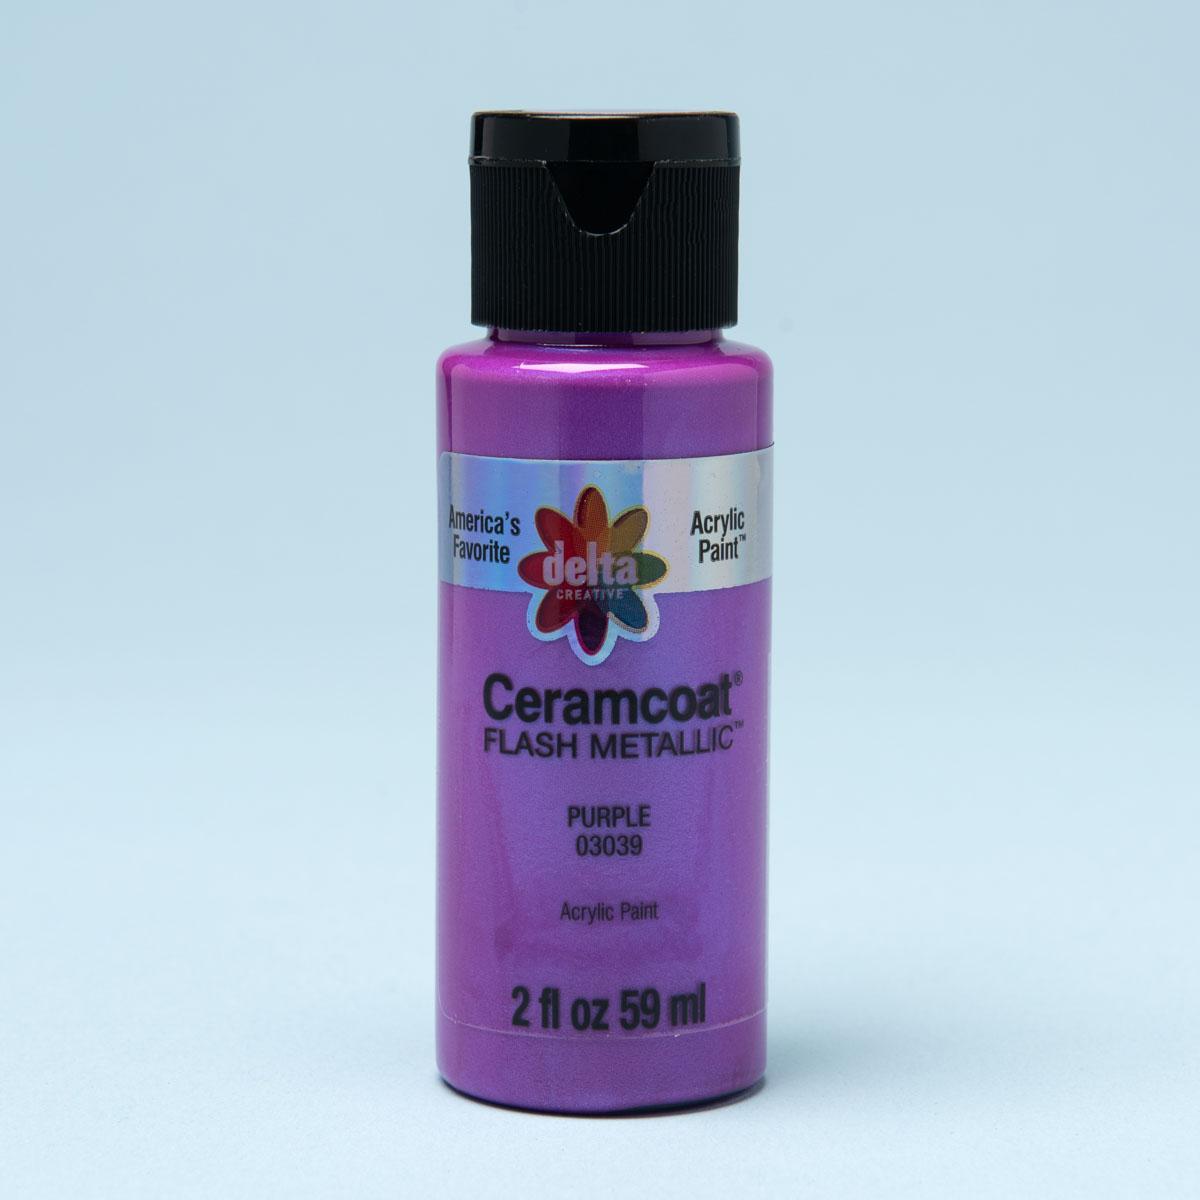 Delta Ceramcoat ® Paint Sets - Flash Metallics, 4 Colors - PROMOCMCFM